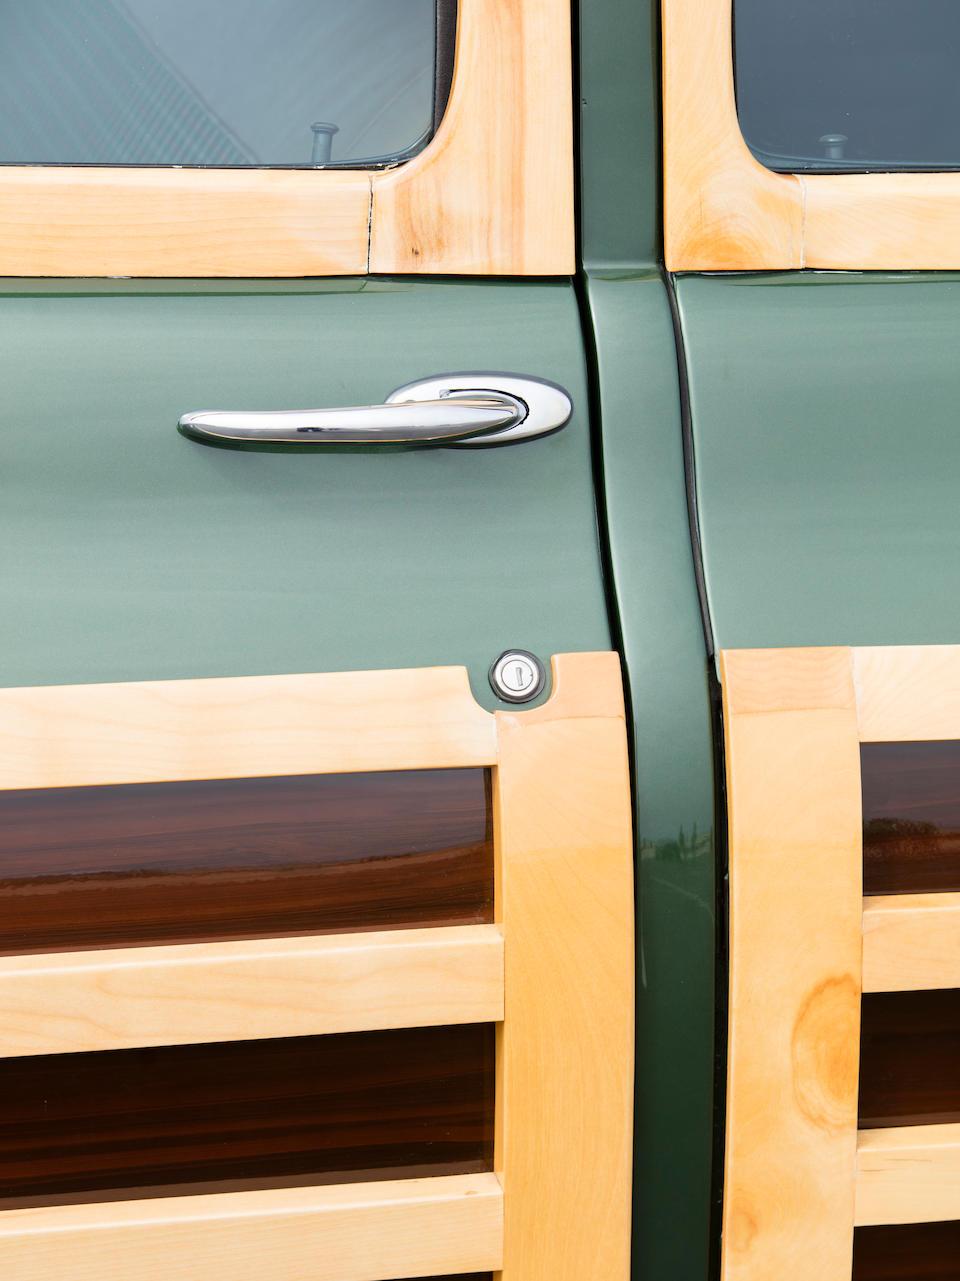 <b>1948 Packard Series 22 Station Sedan</b><br />Chassis no. 22932008